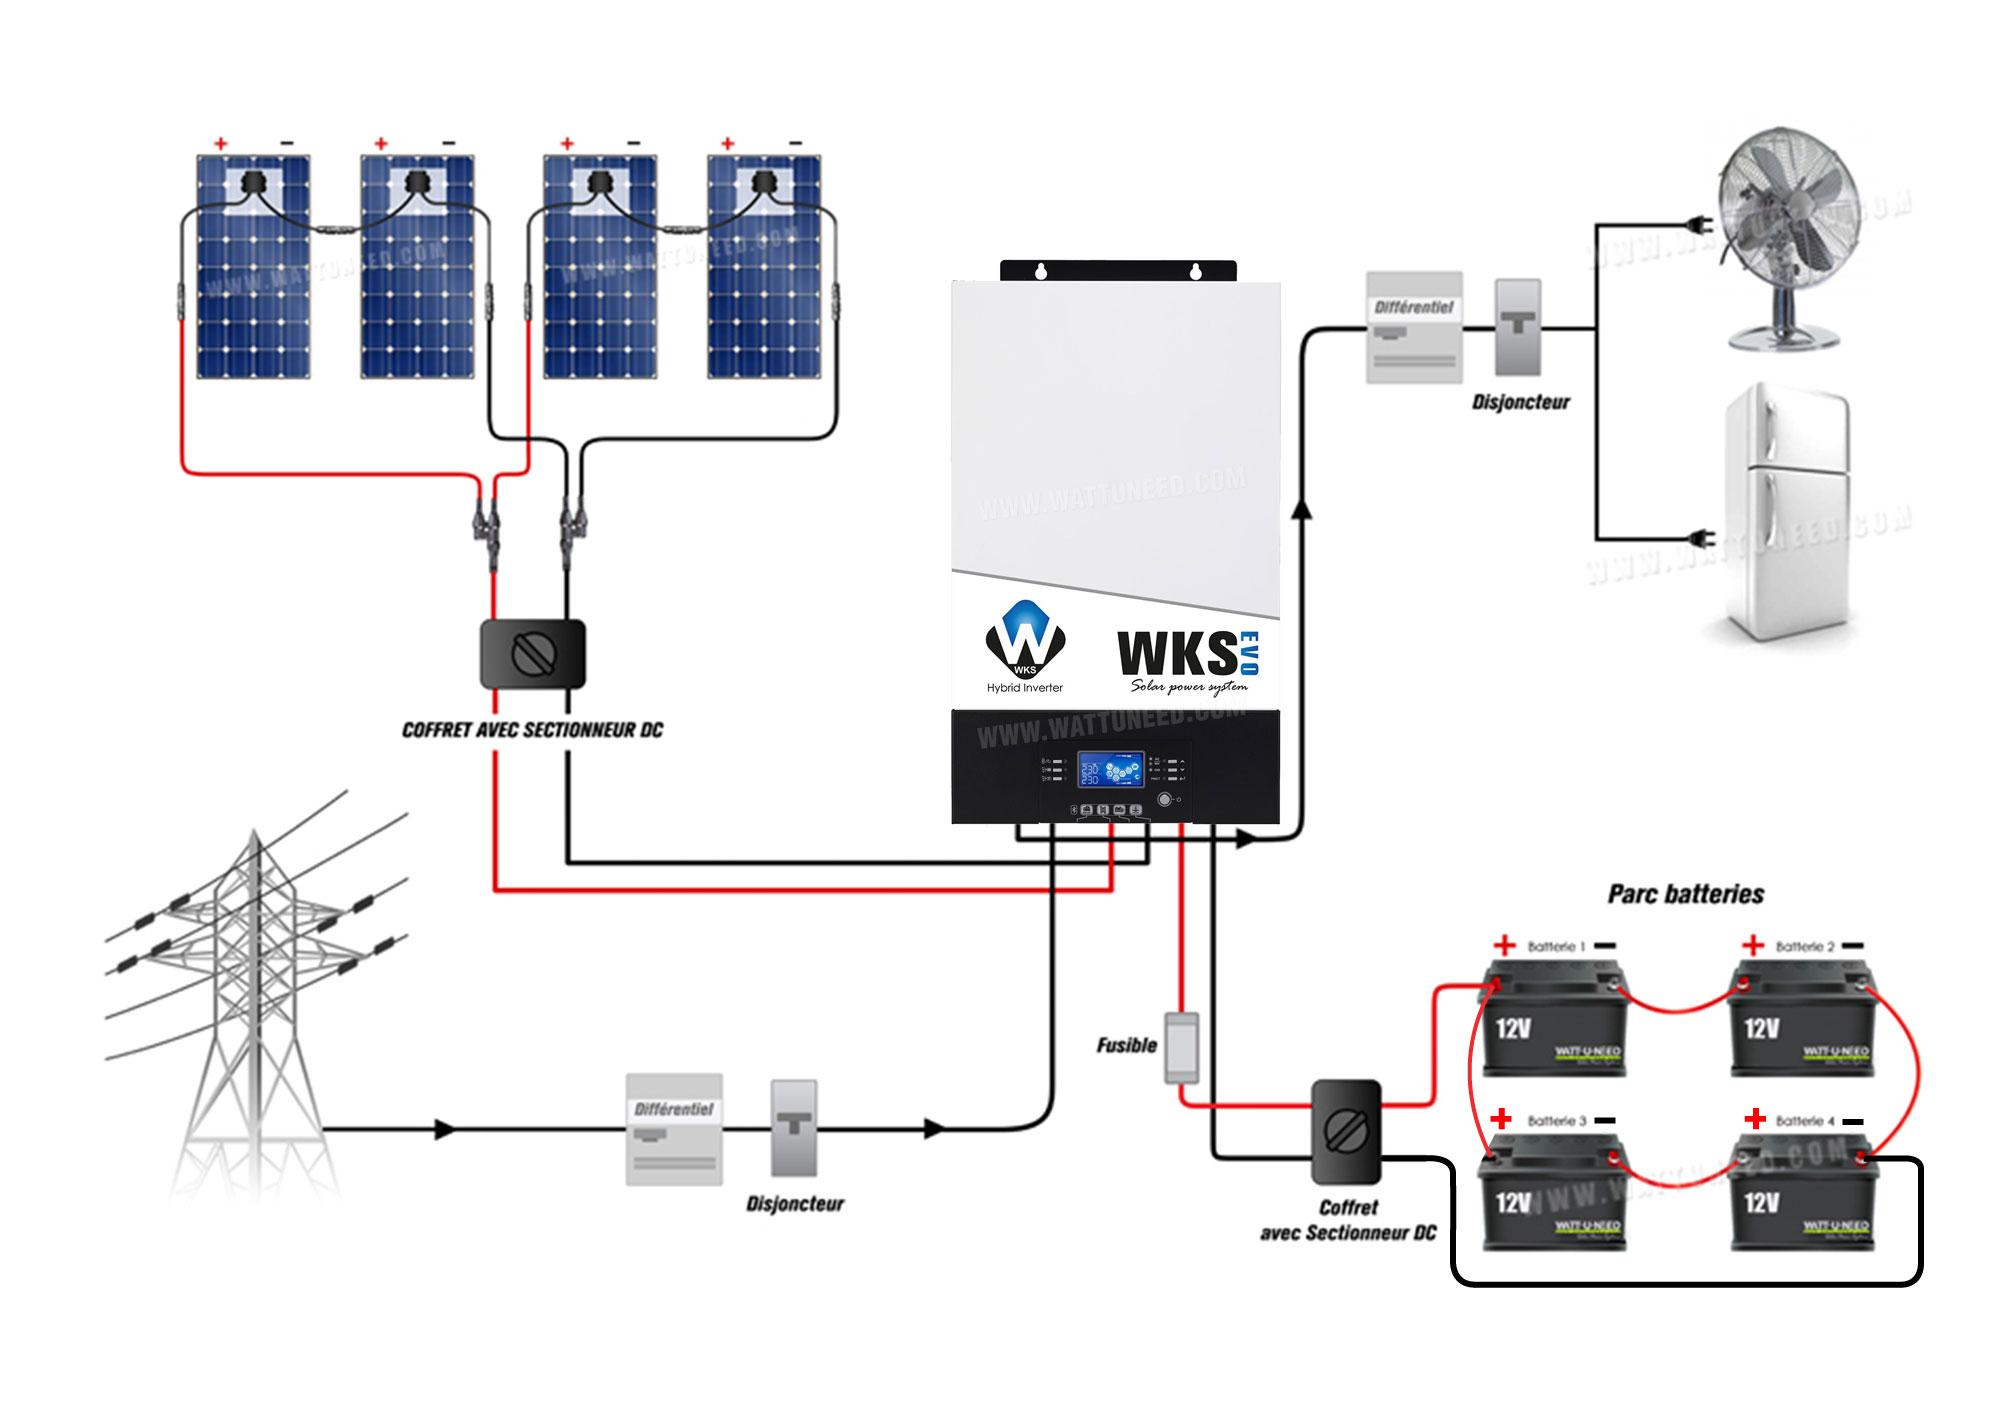 Schematic diagram with the WKS EVO inverter